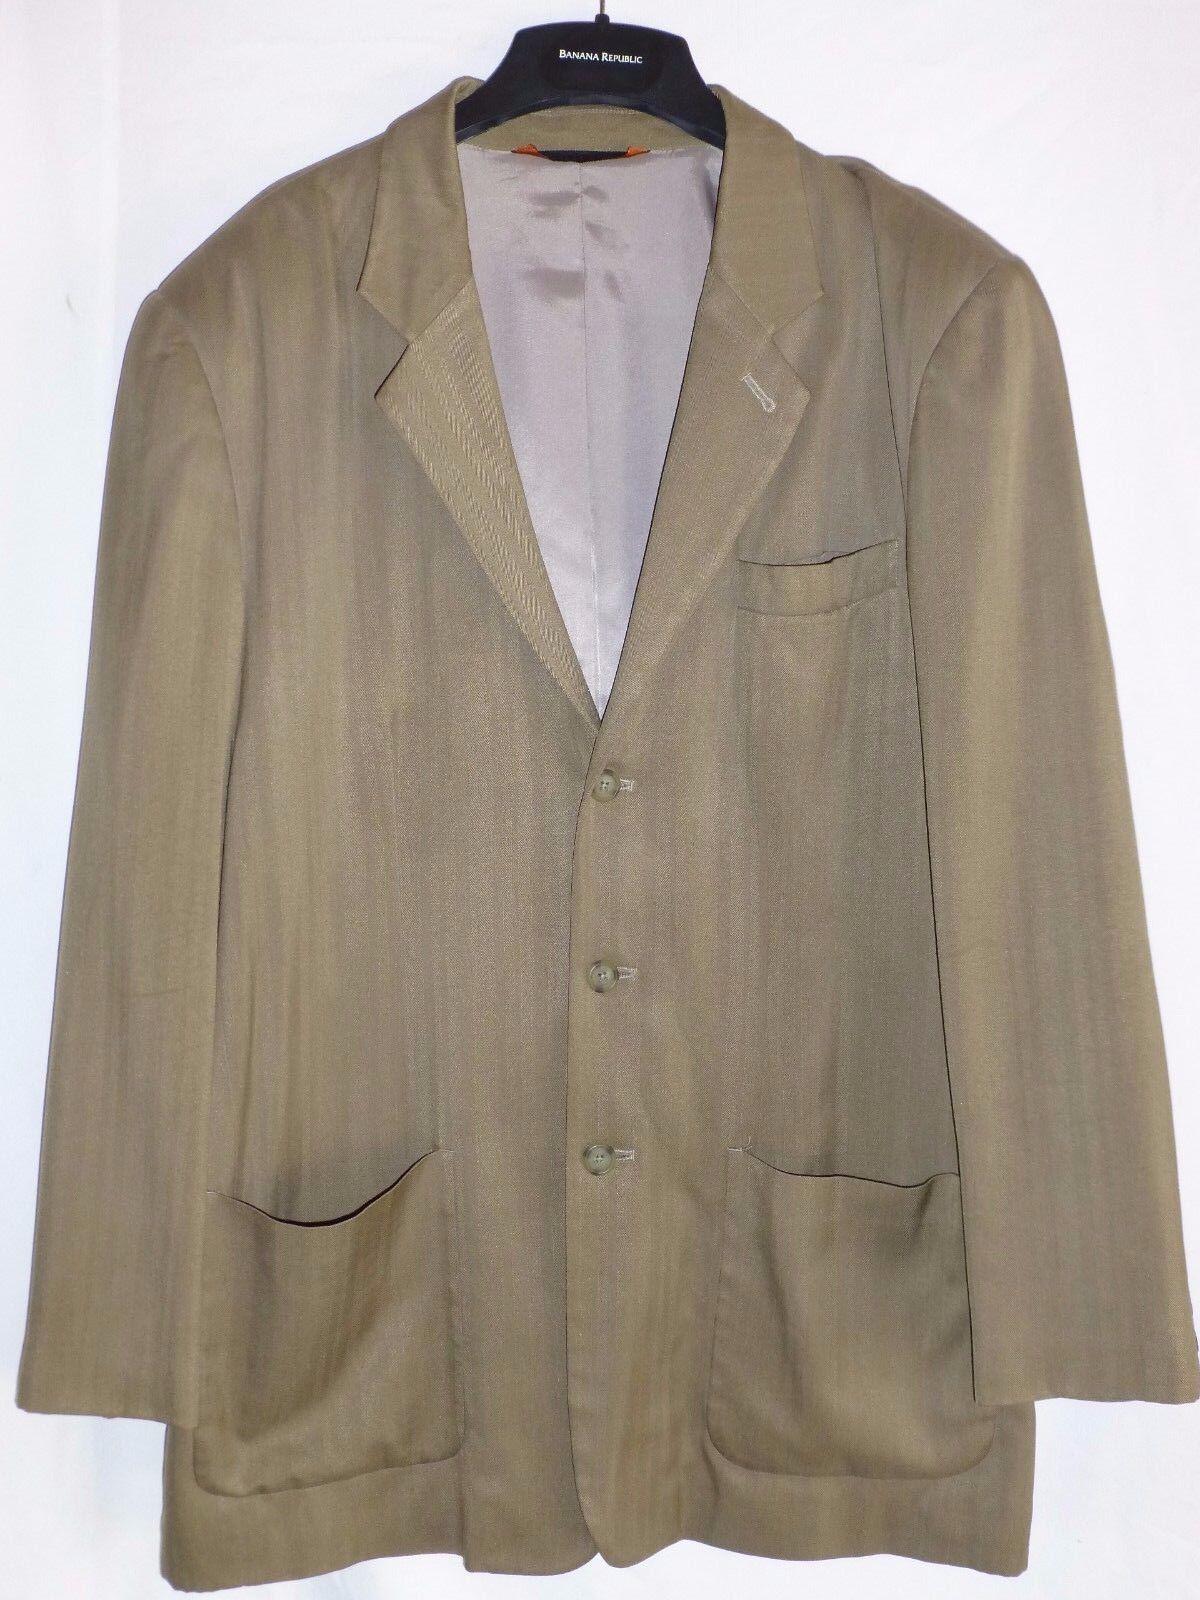 New 44 Khaki Tan 100% SILK Herringbone Sport Coat Blazer Axis Nordstrom  54